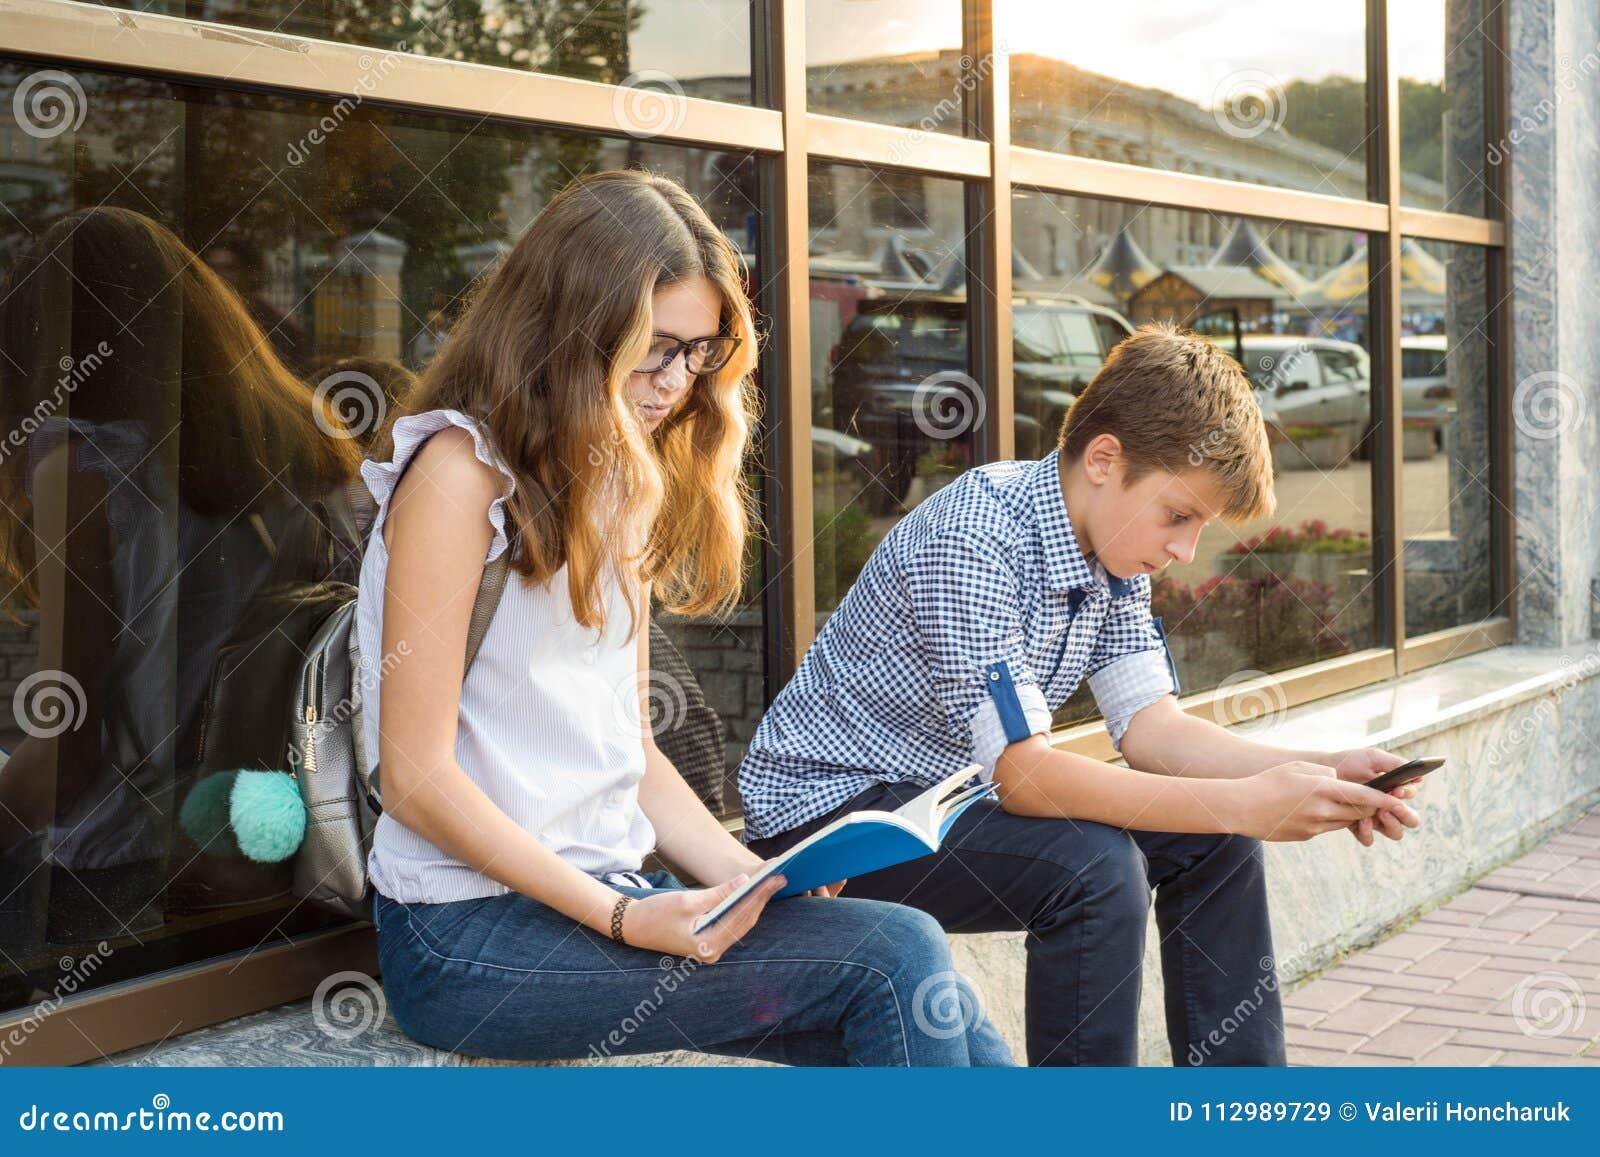 Children teenagers, break reading book and using smartphone.